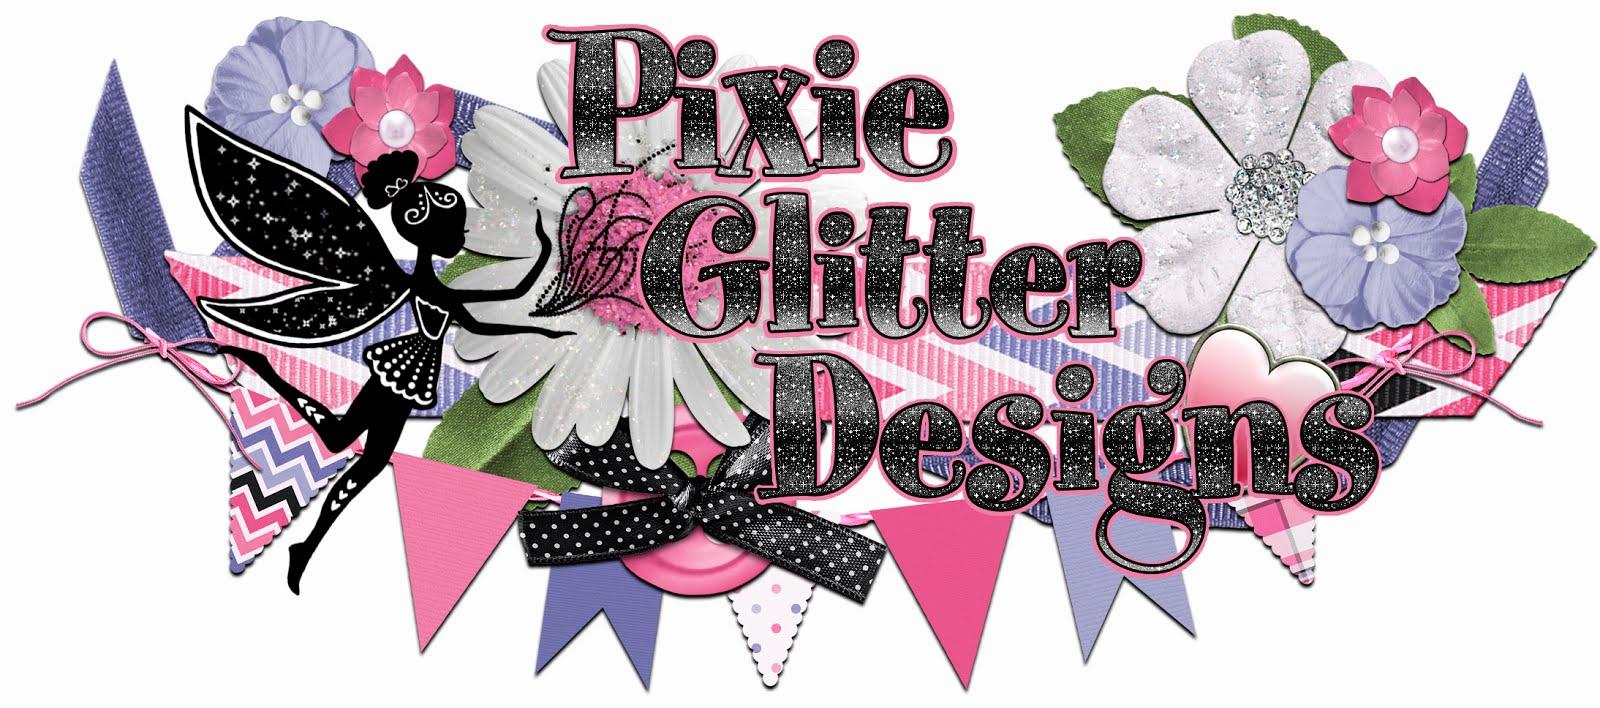 Pixie Glitter Designs